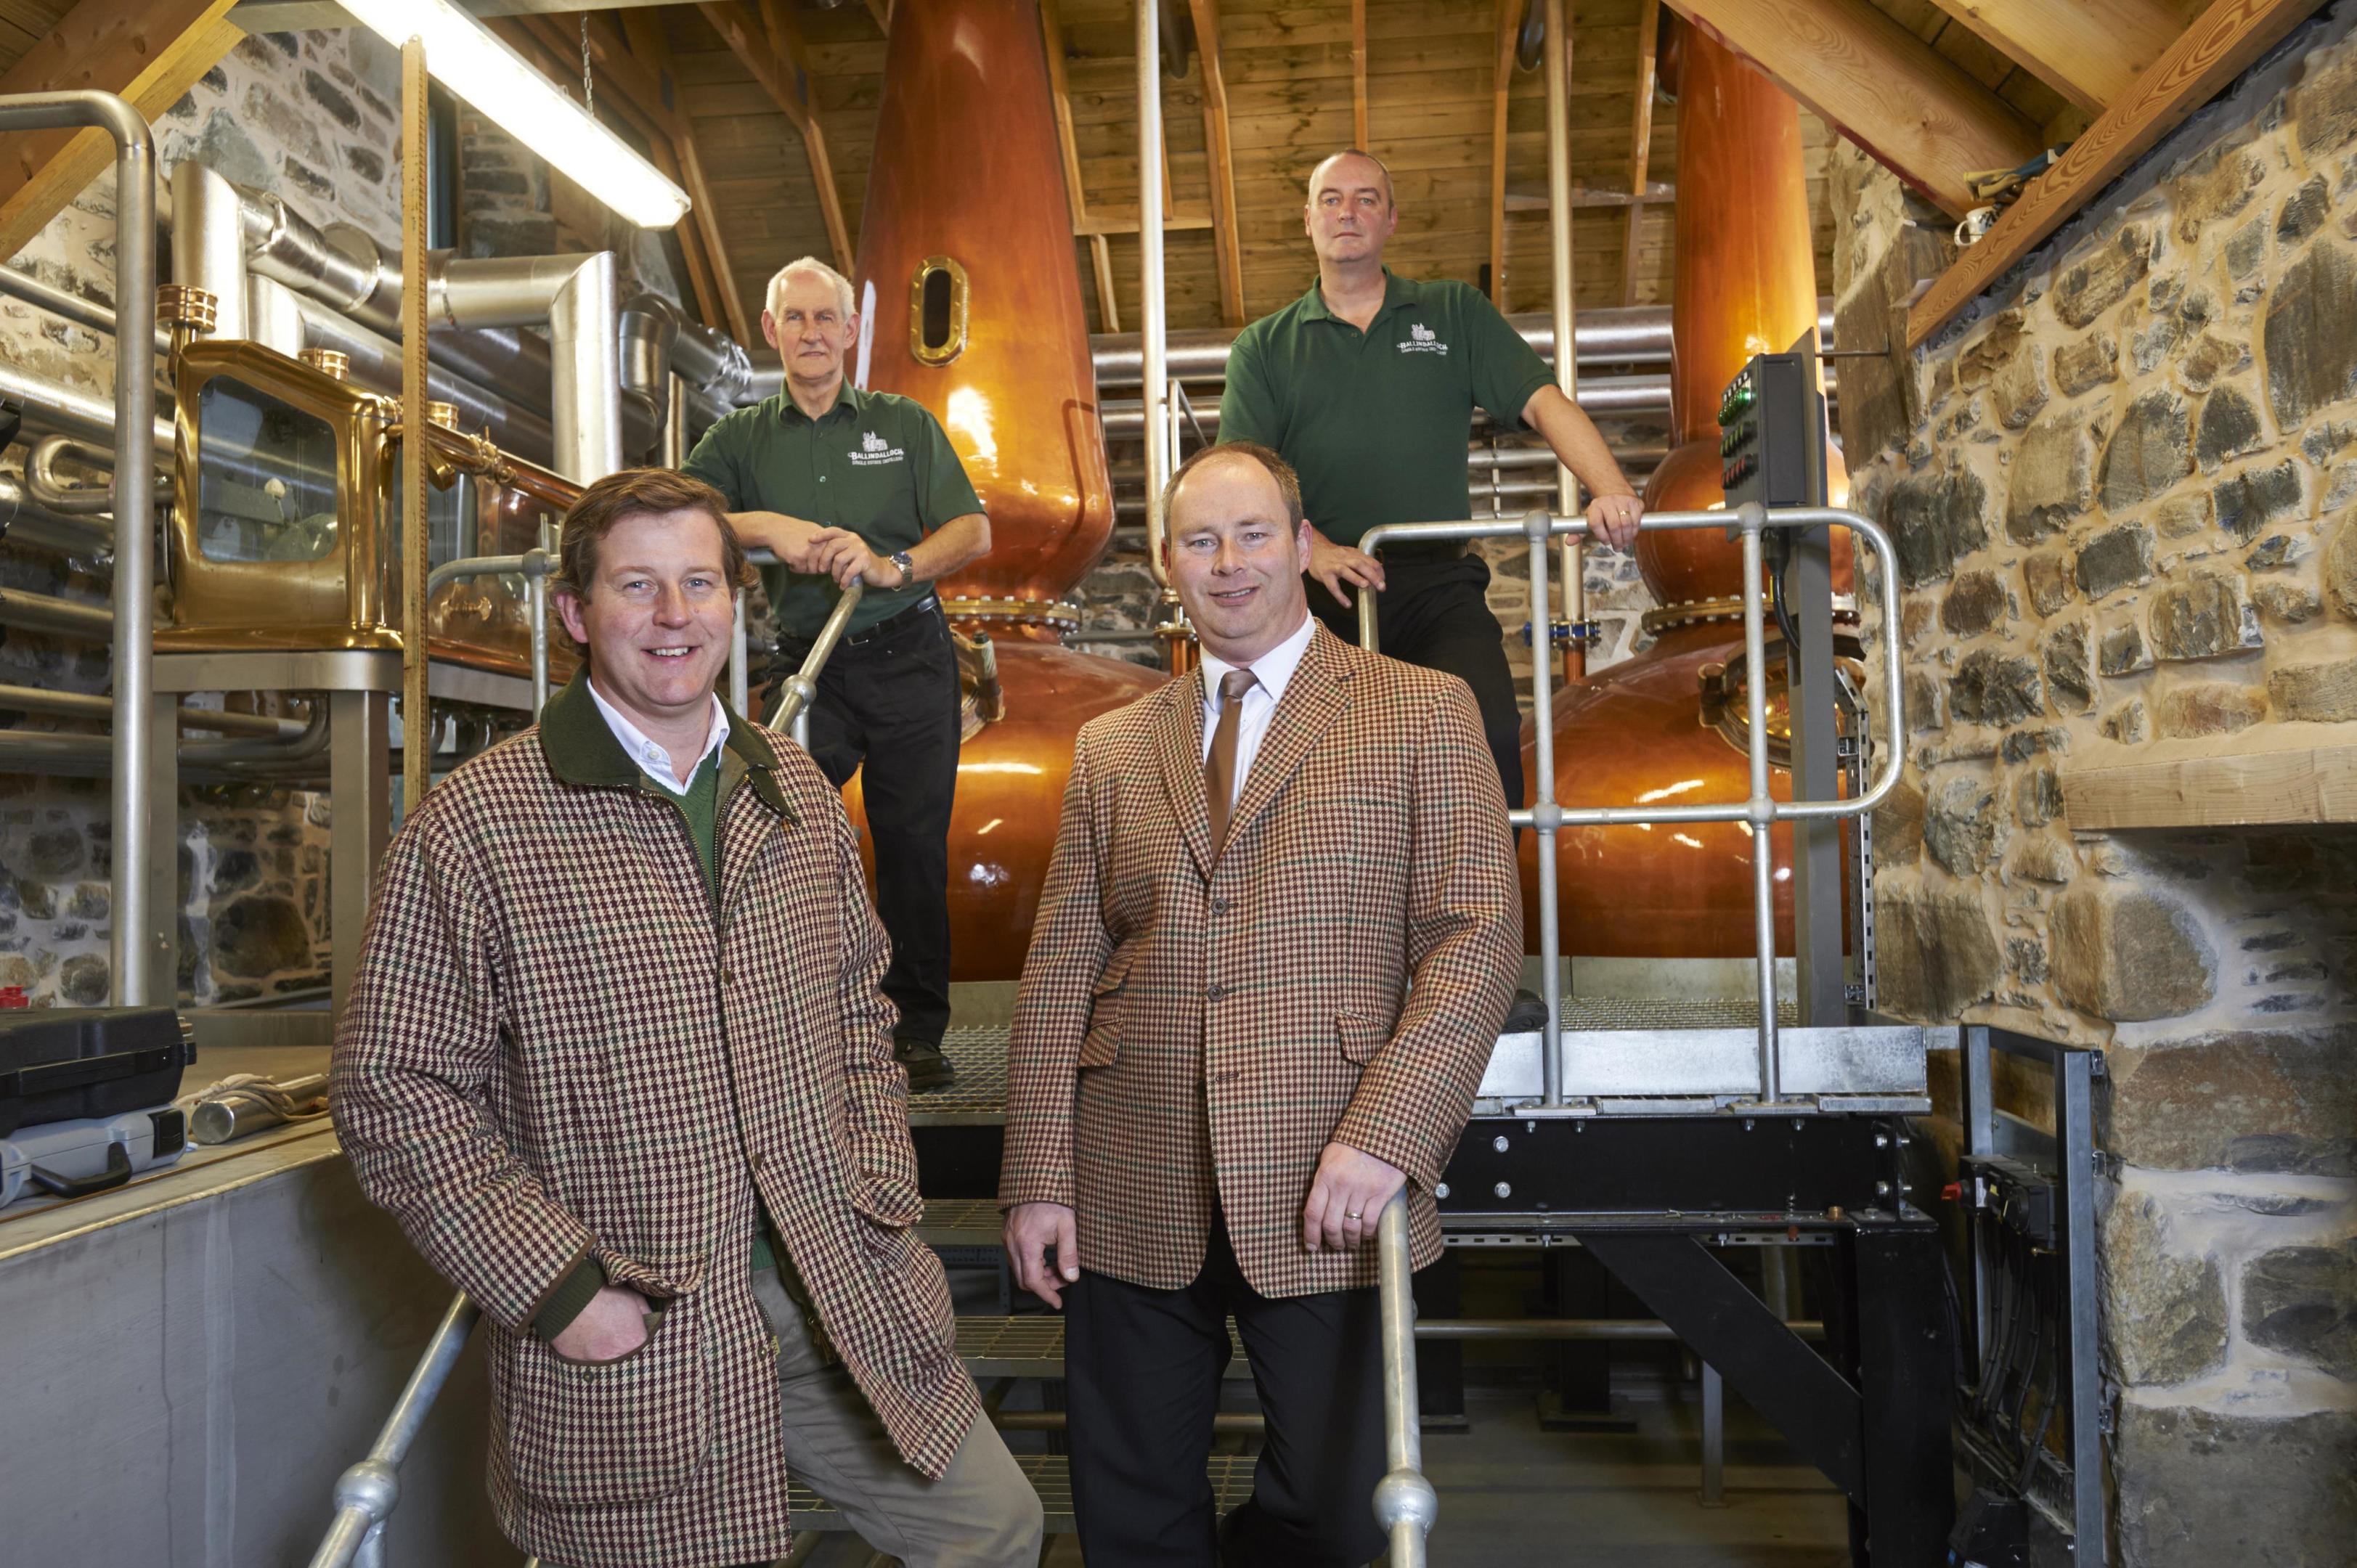 LtoR-Guy-Macpherson-Grant-Charlie-Smith-Master-Distiller-Brian-Robinson-and-Colin-Poppy-Distillery-Assistant.jpg